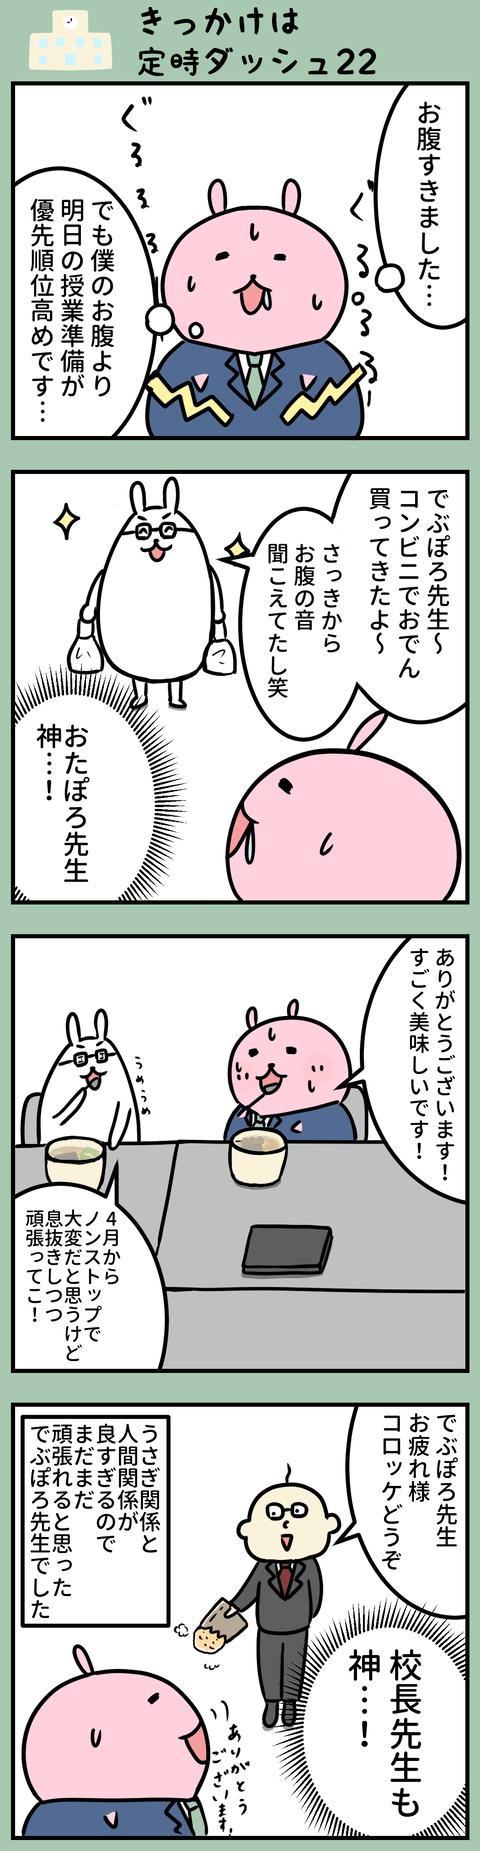 manga-yuzuporo79-1